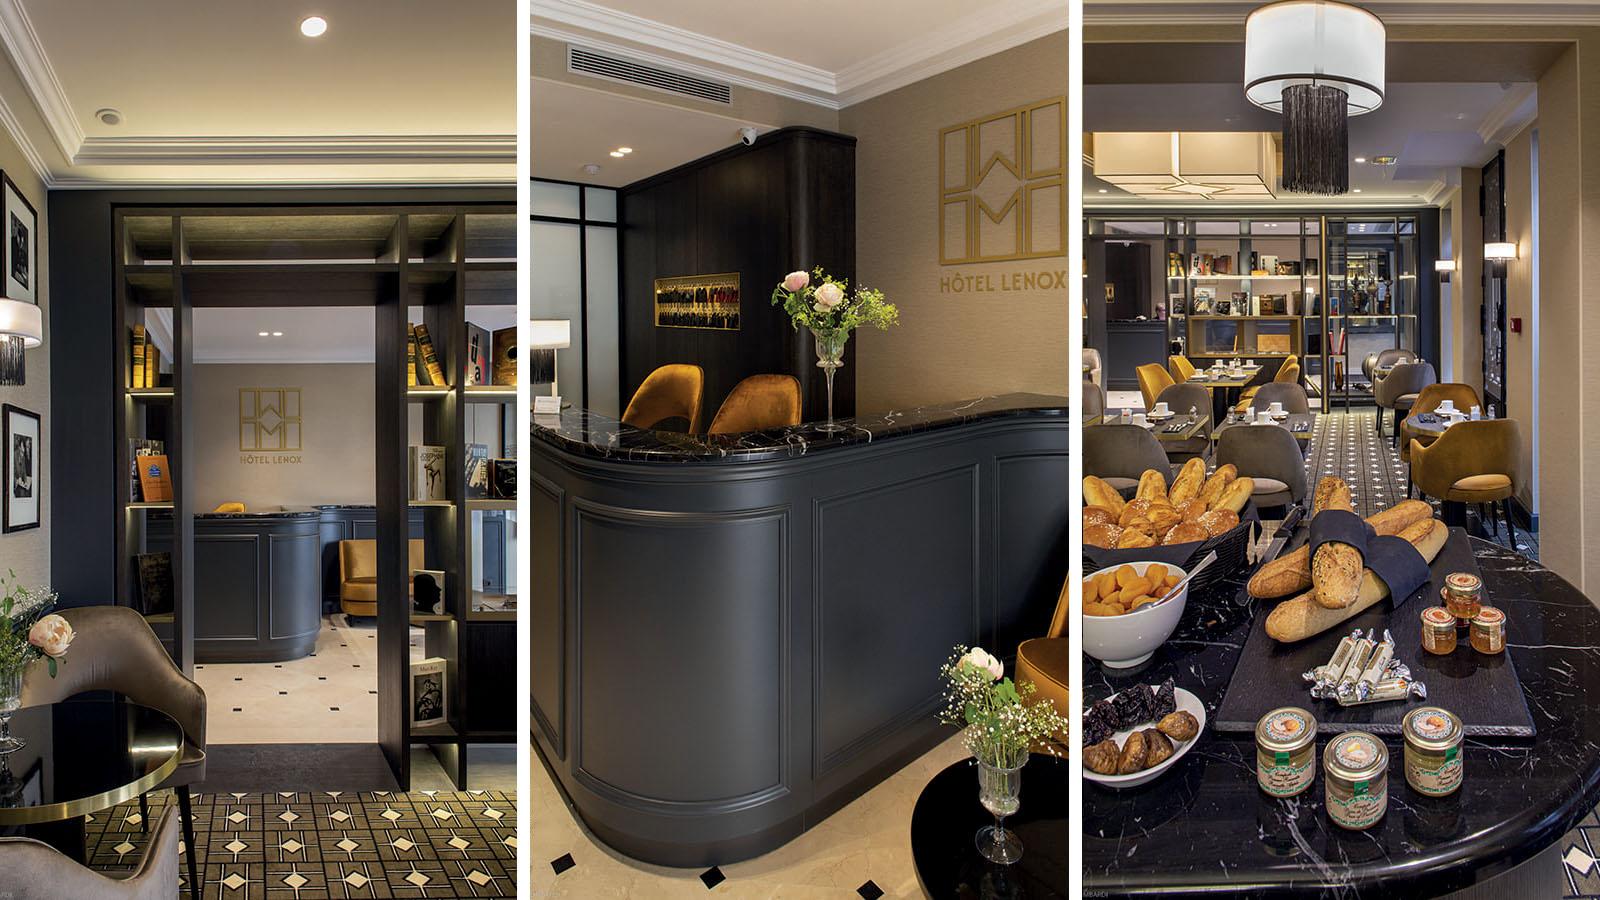 EFI Design Hotel Lenox Paris Efi Design 12 1373